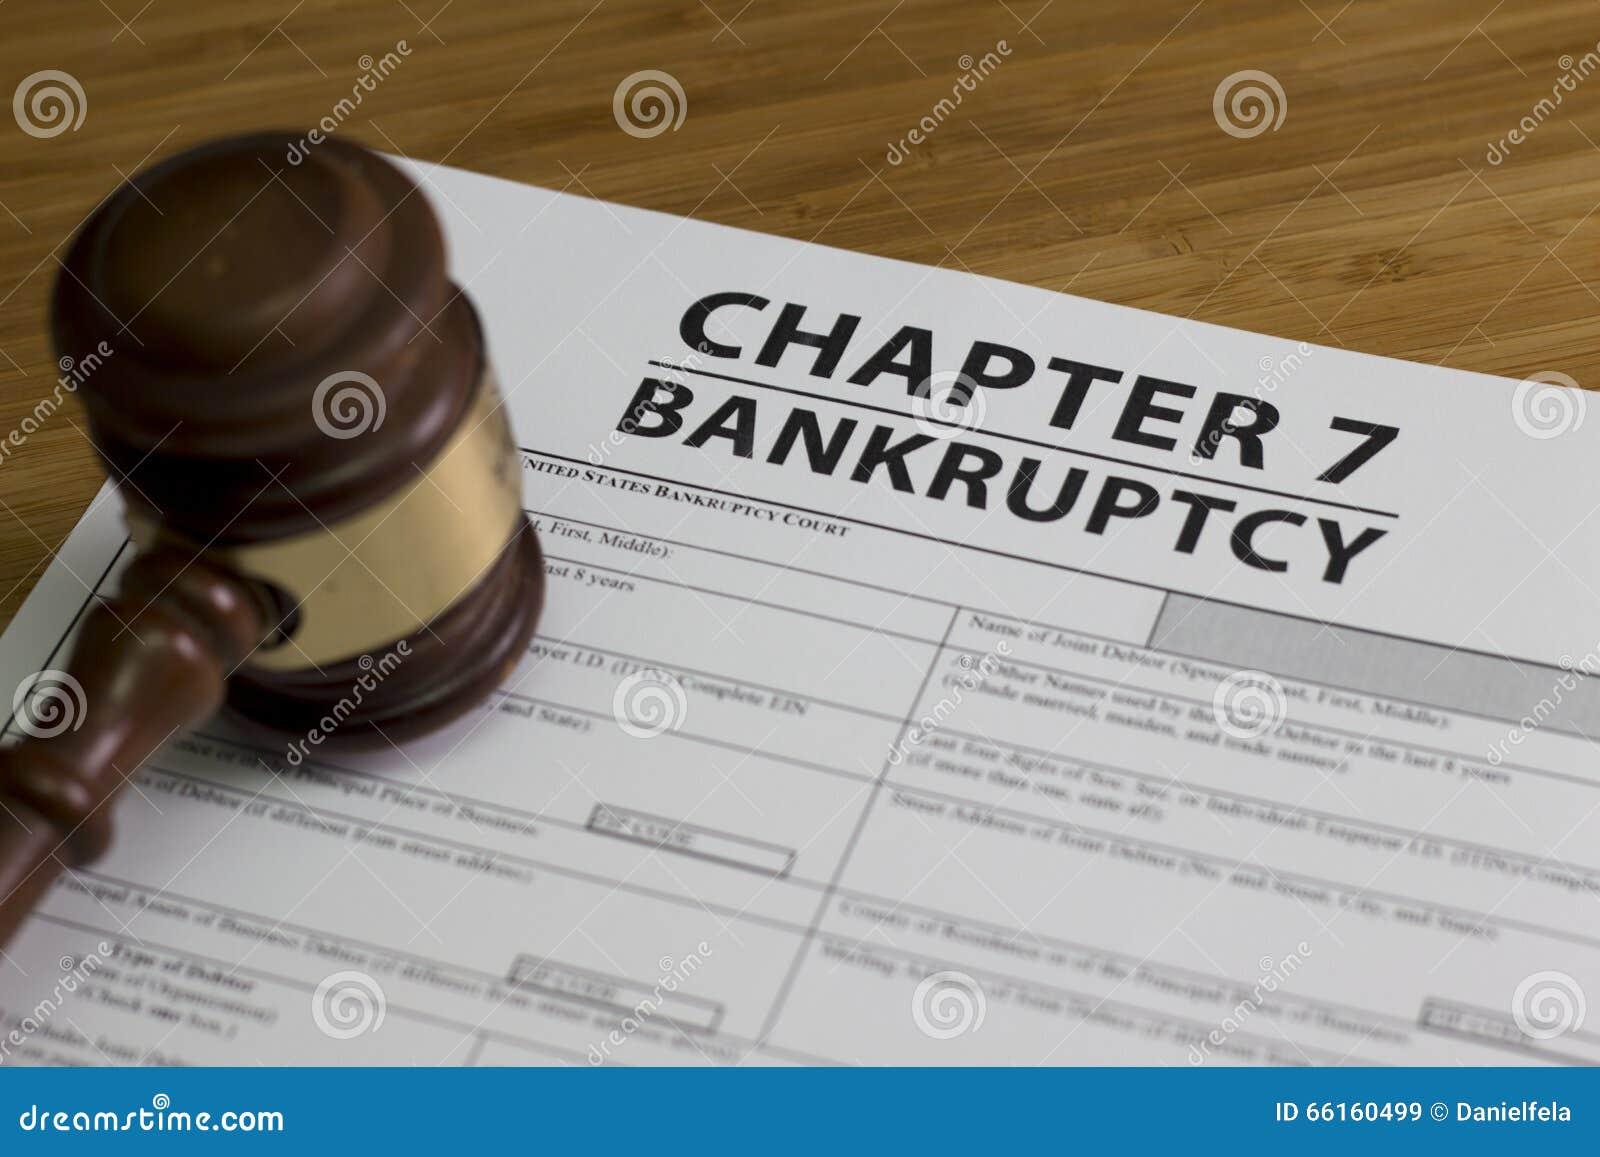 Bankruptcy Royalty-Free Stock Photo | CartoonDealer.com ...